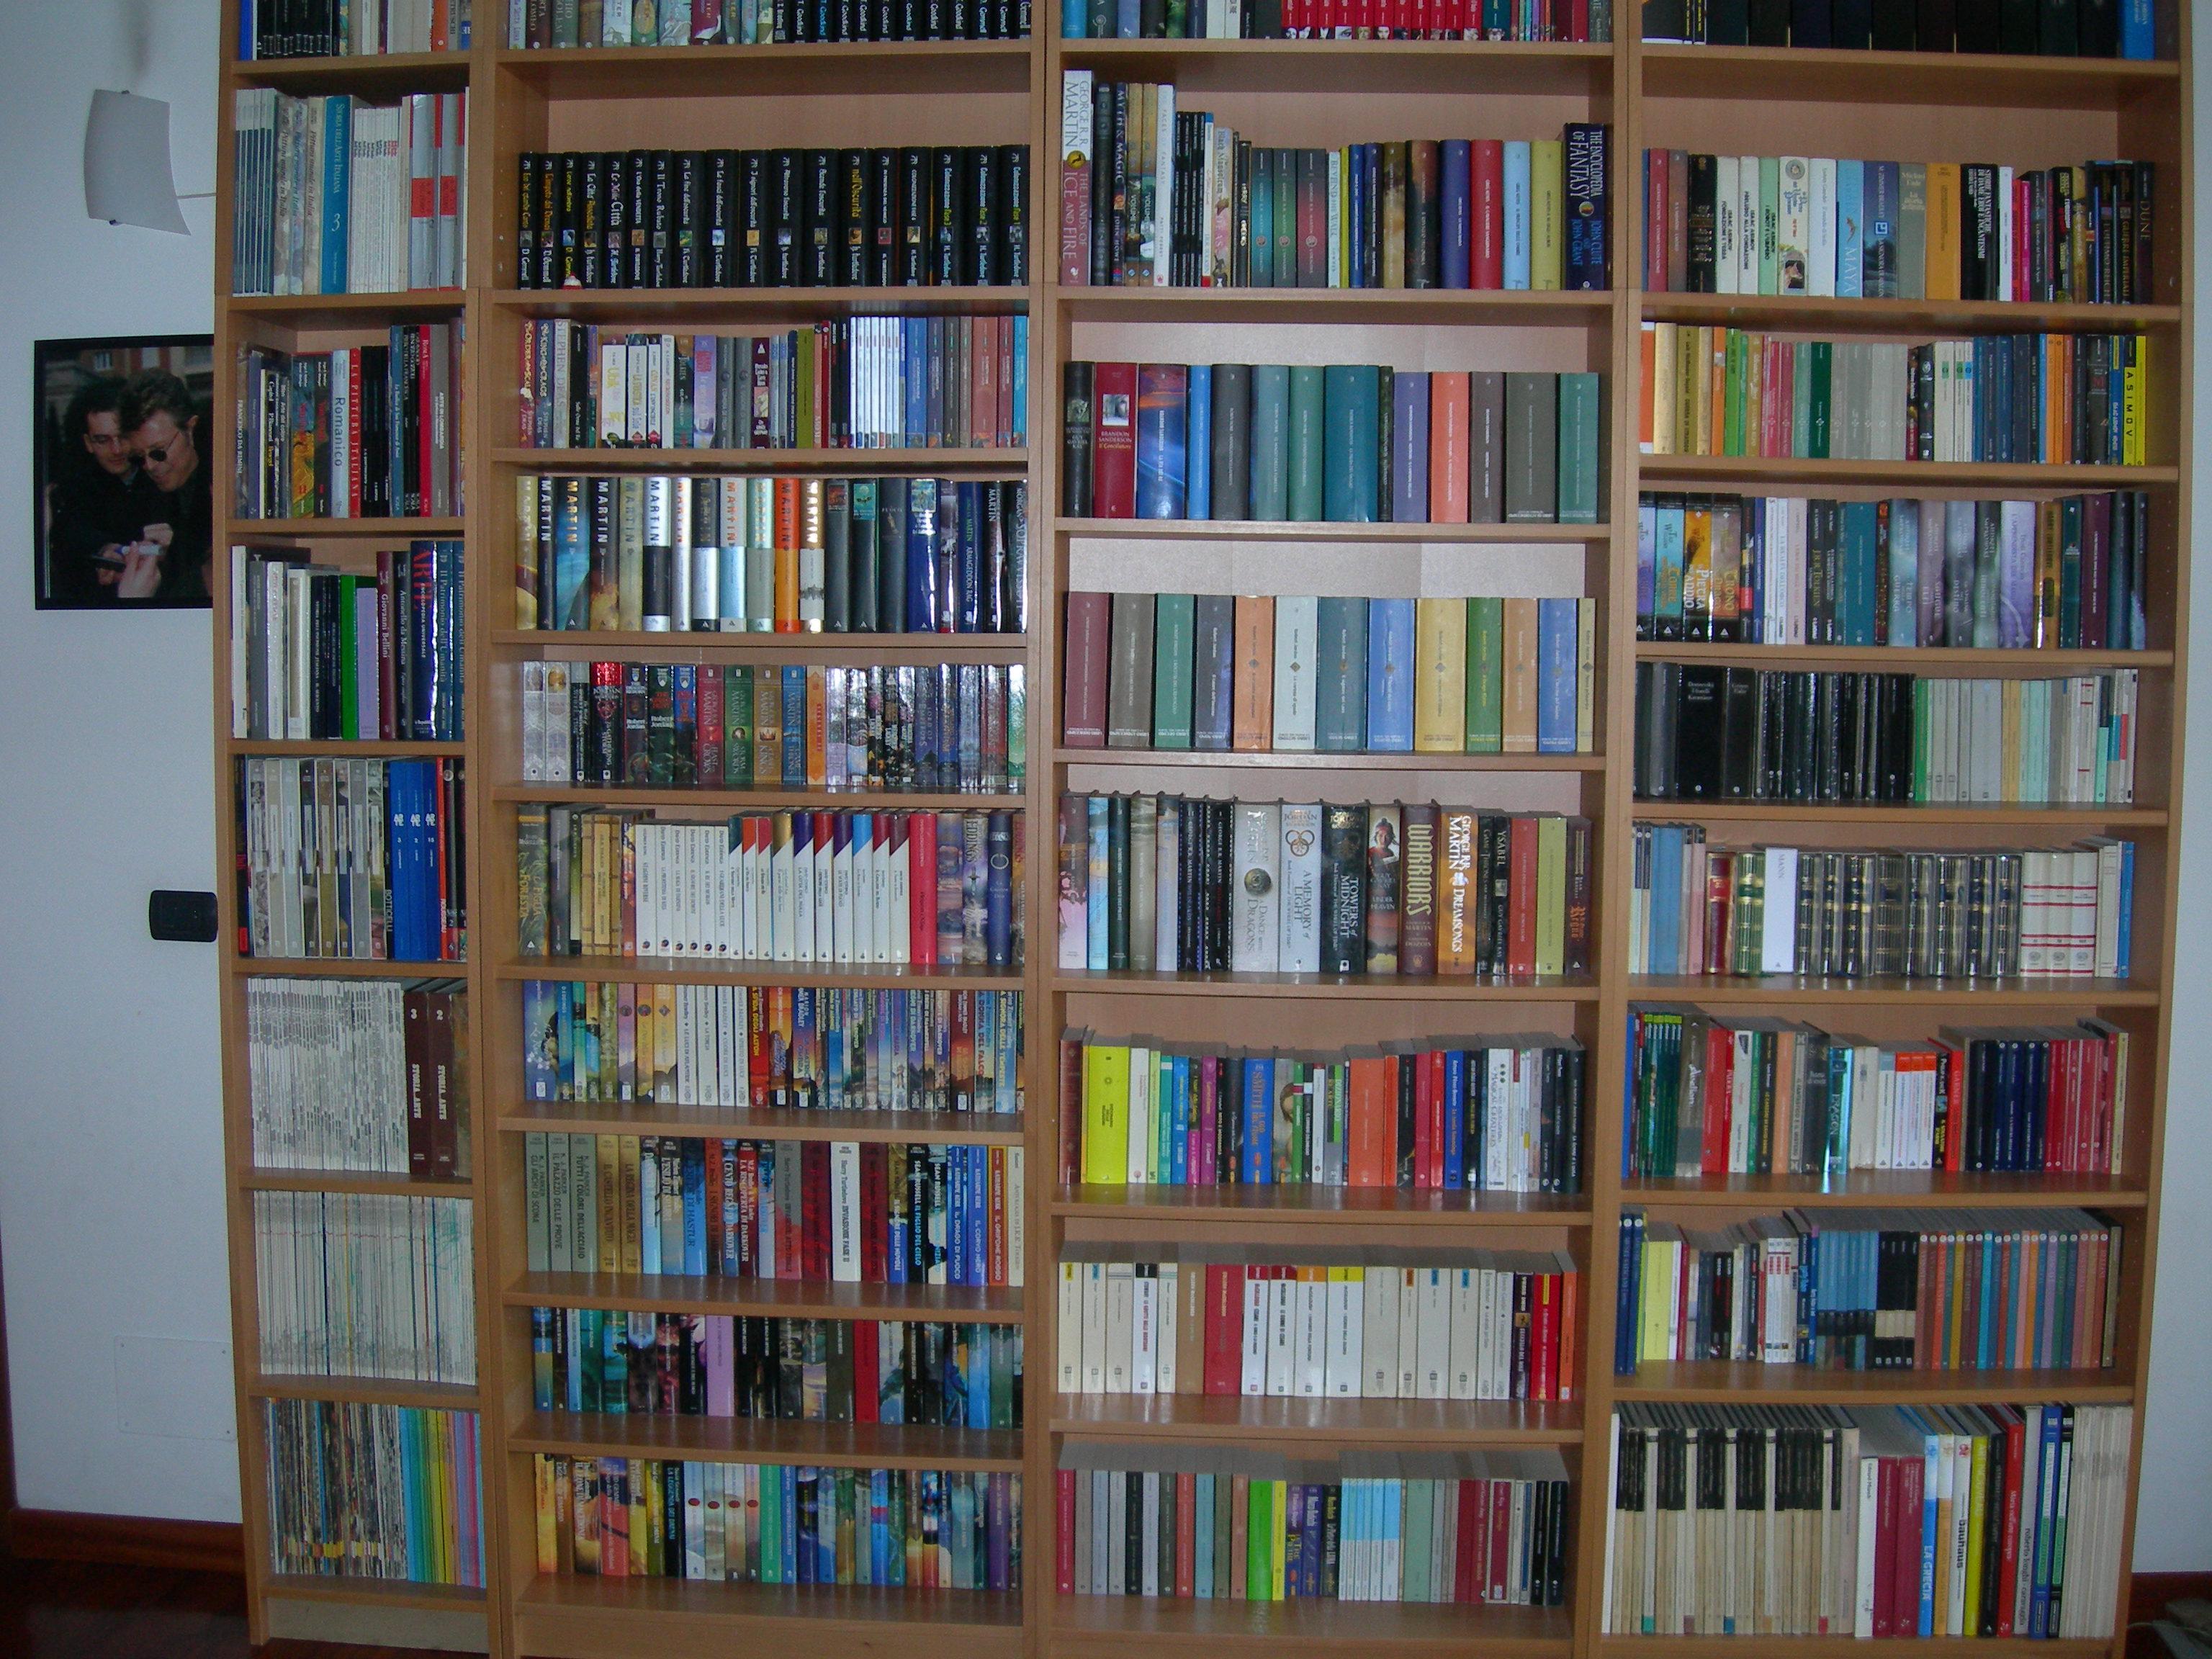 libreria la biblioteca: